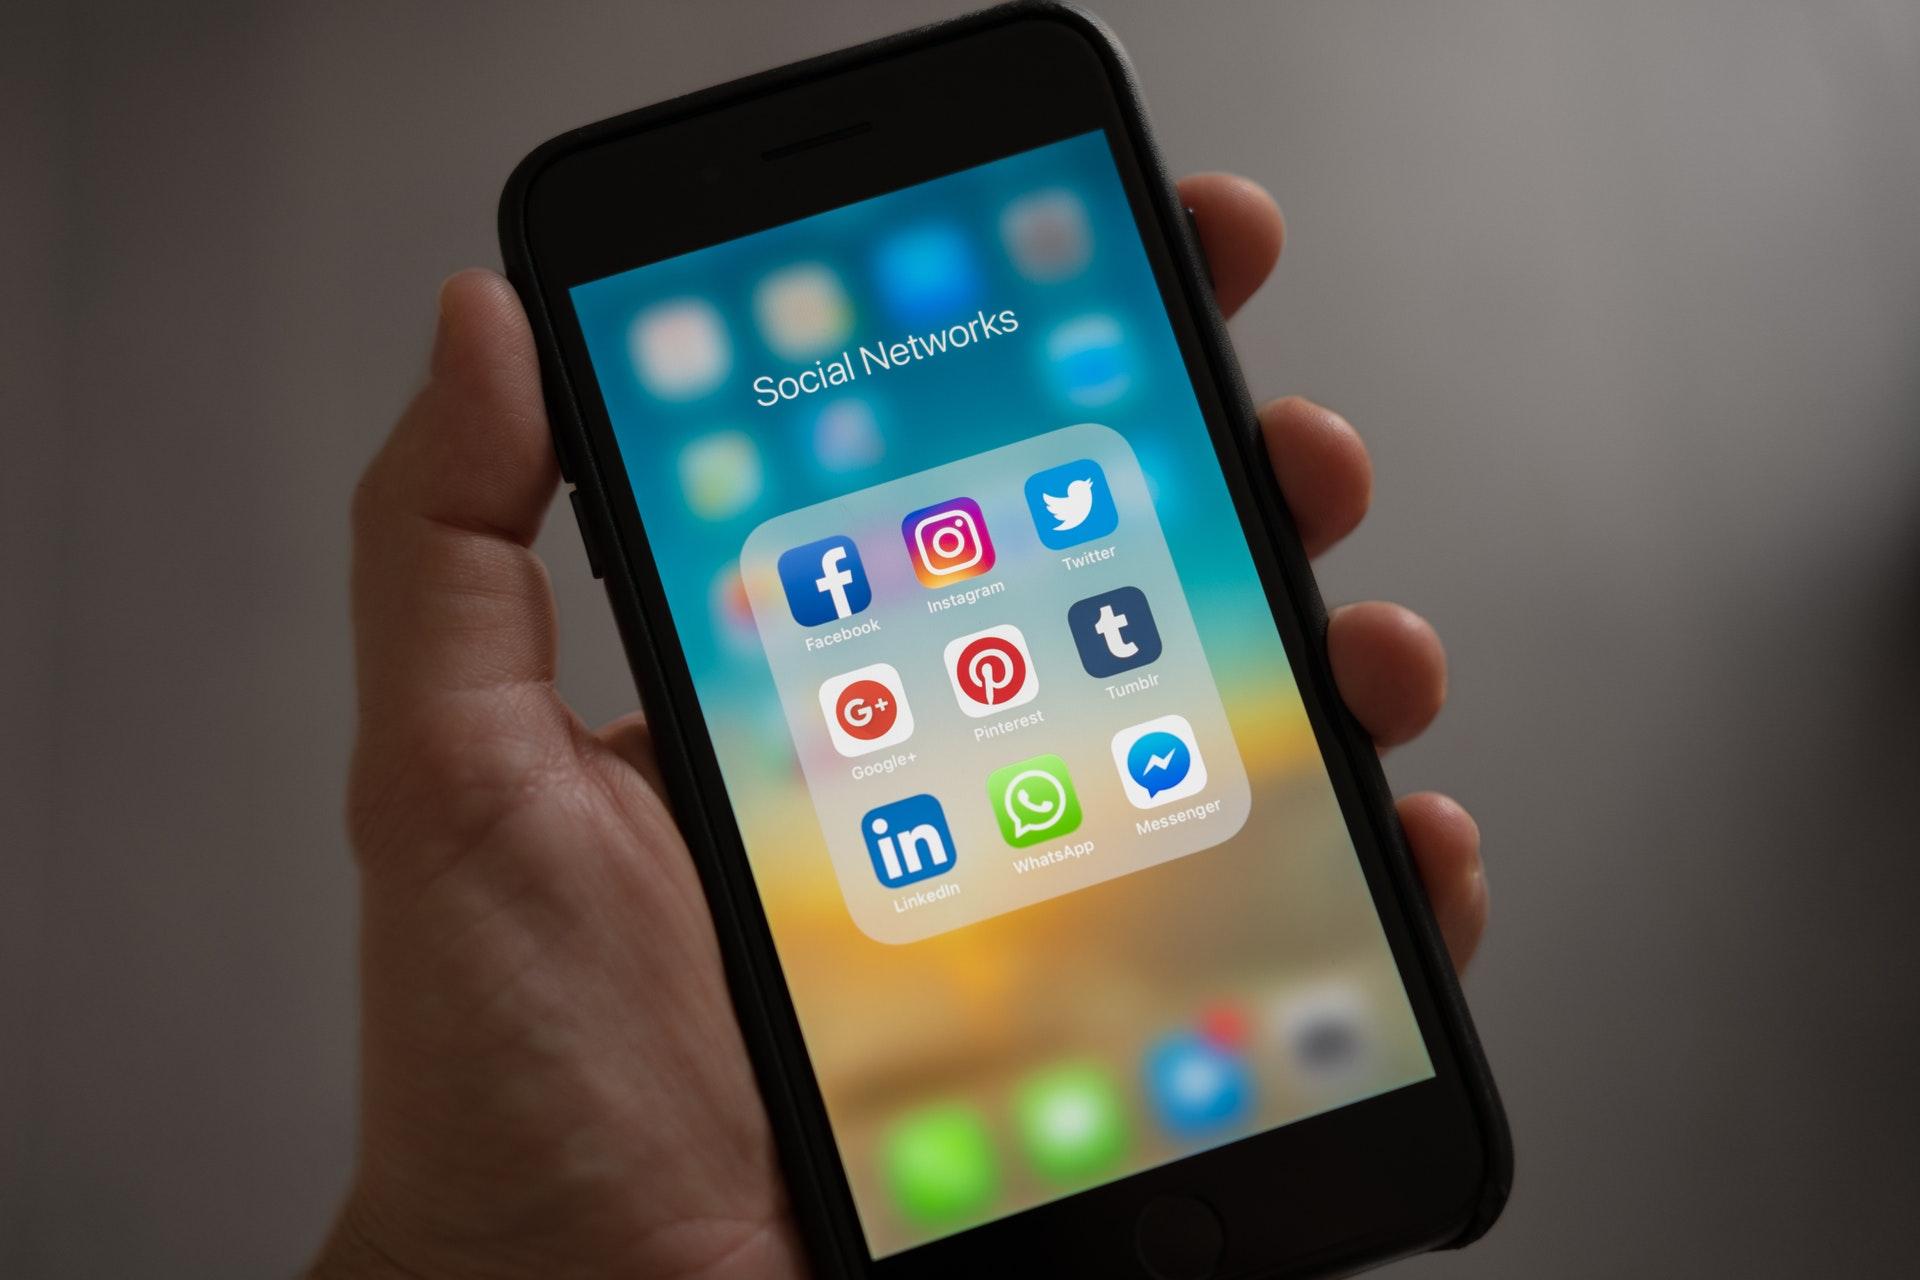 Social Media กับ Contact Center ยุคใหม่สามารถเข้ากันได้ดี